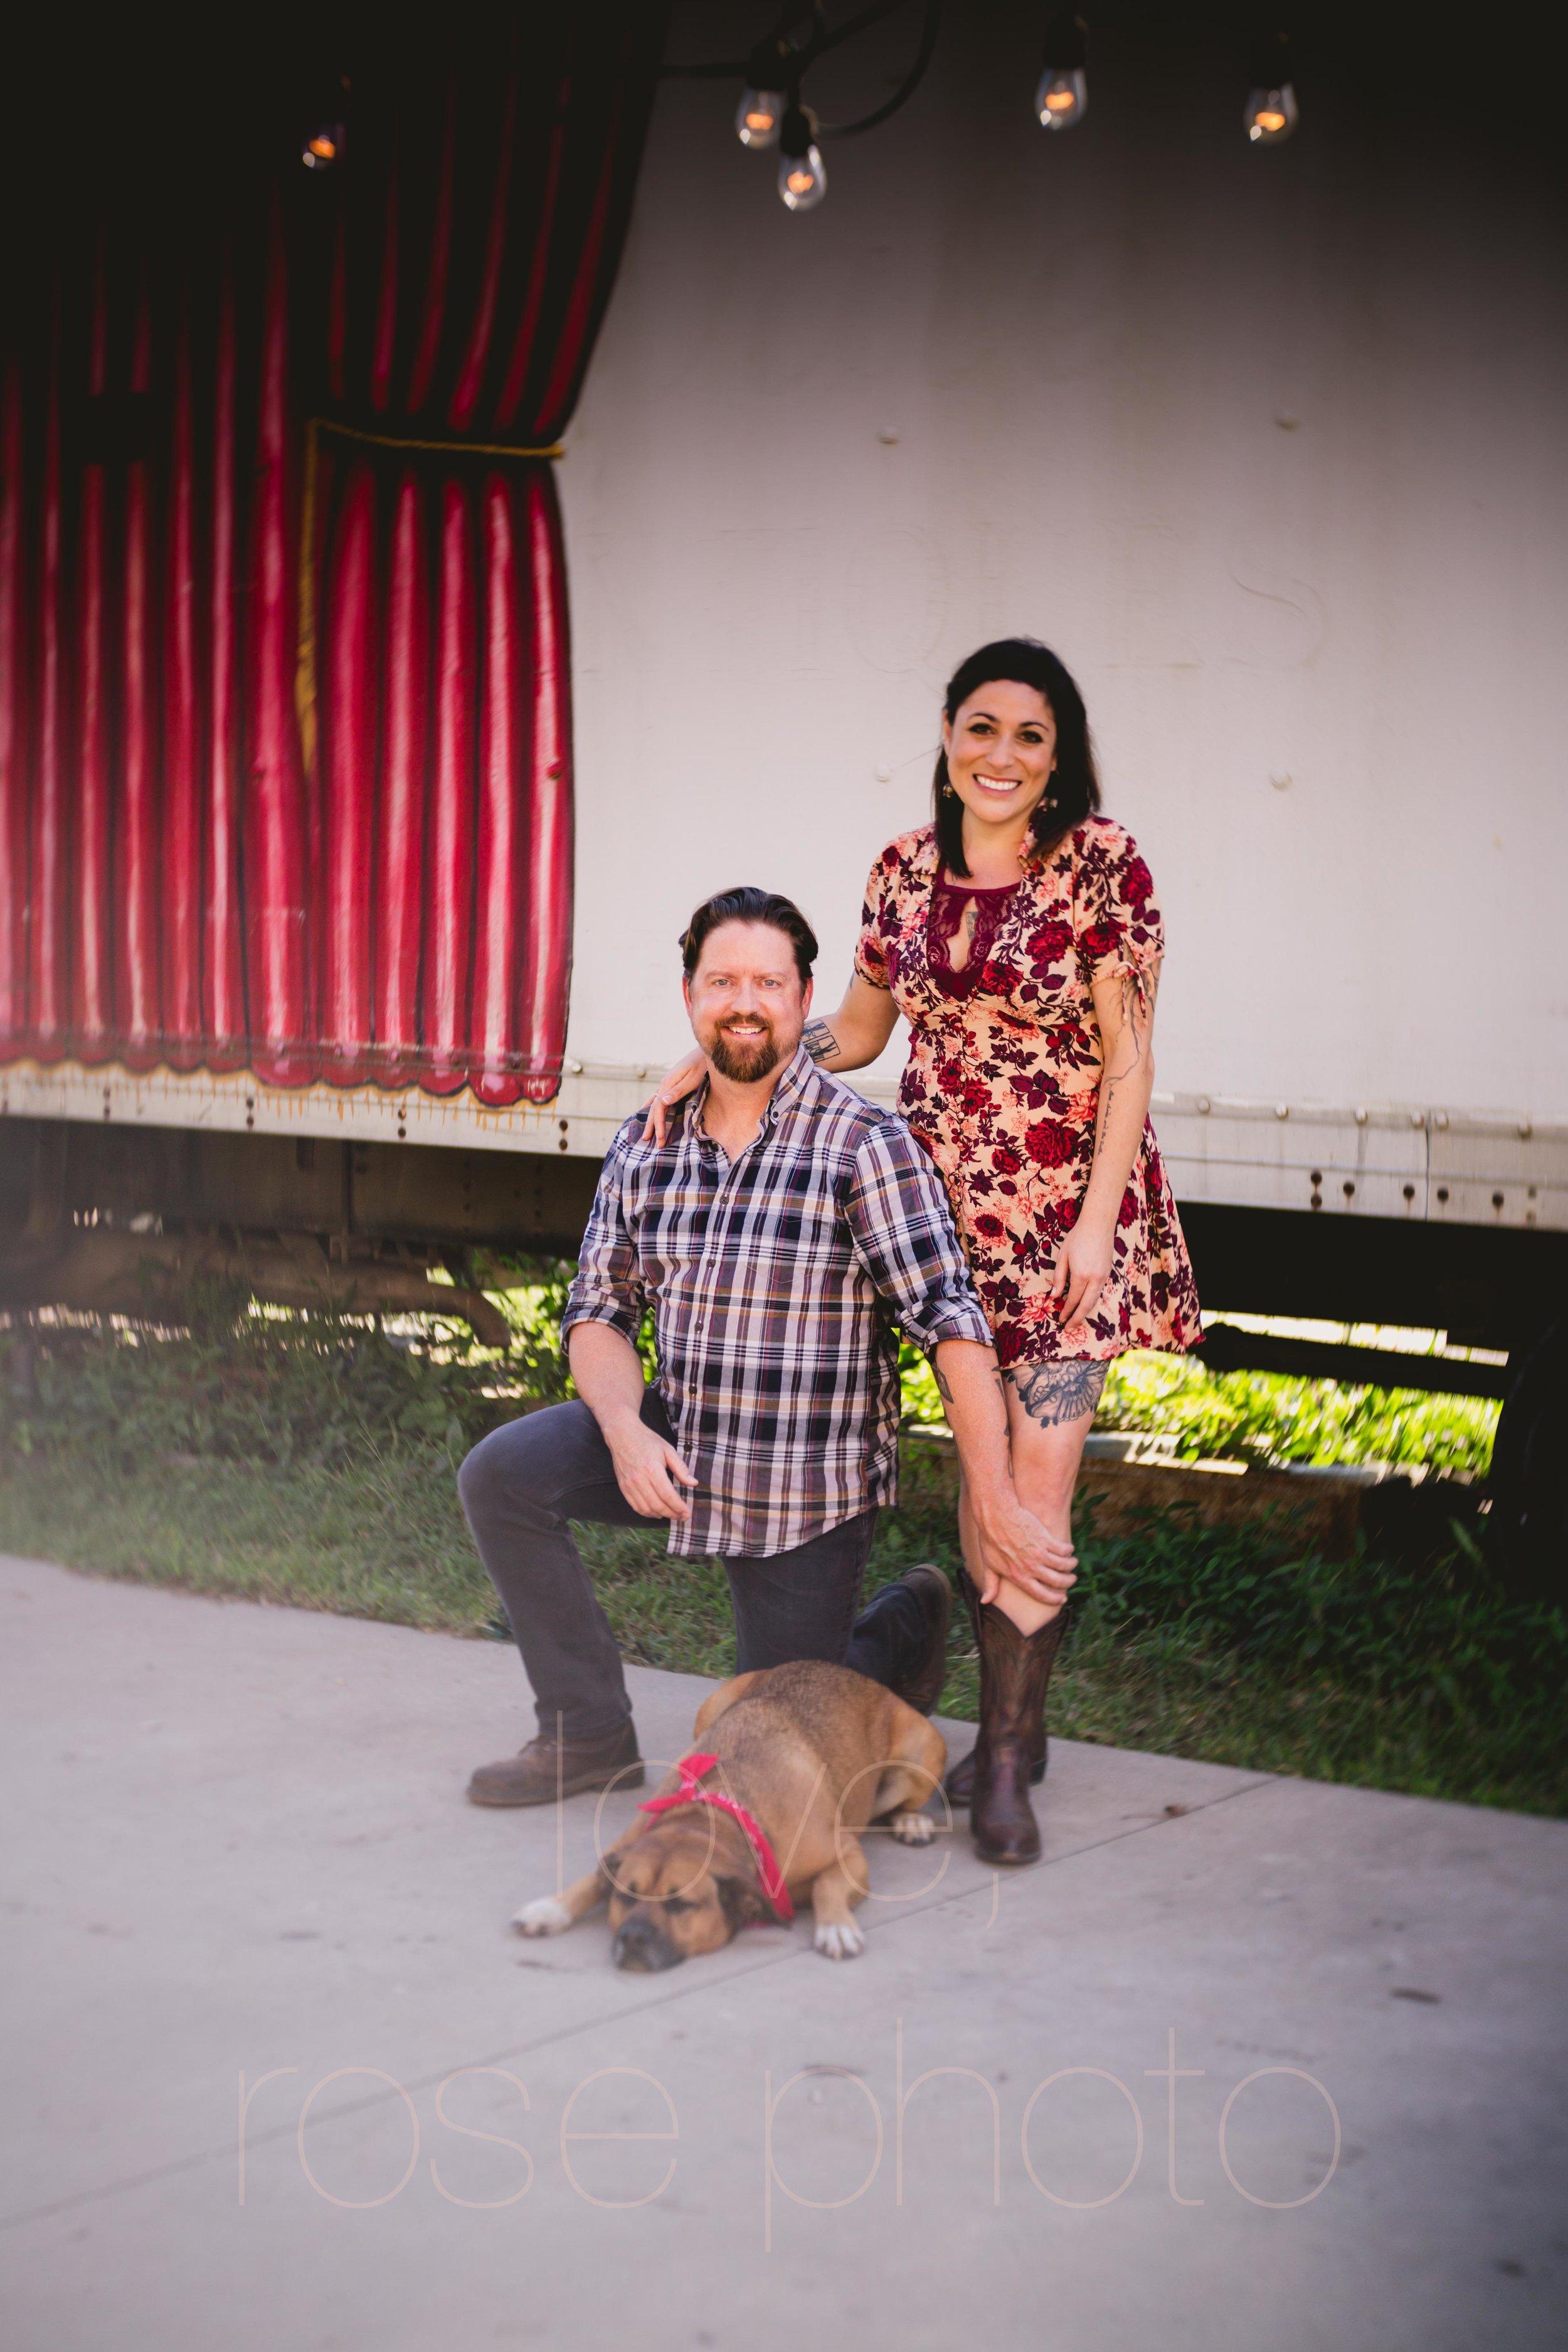 Jane Kramer Ashevegas Jason Sanford WNC Asheville wedding engagement shoot by Rose Photo-7.jpg